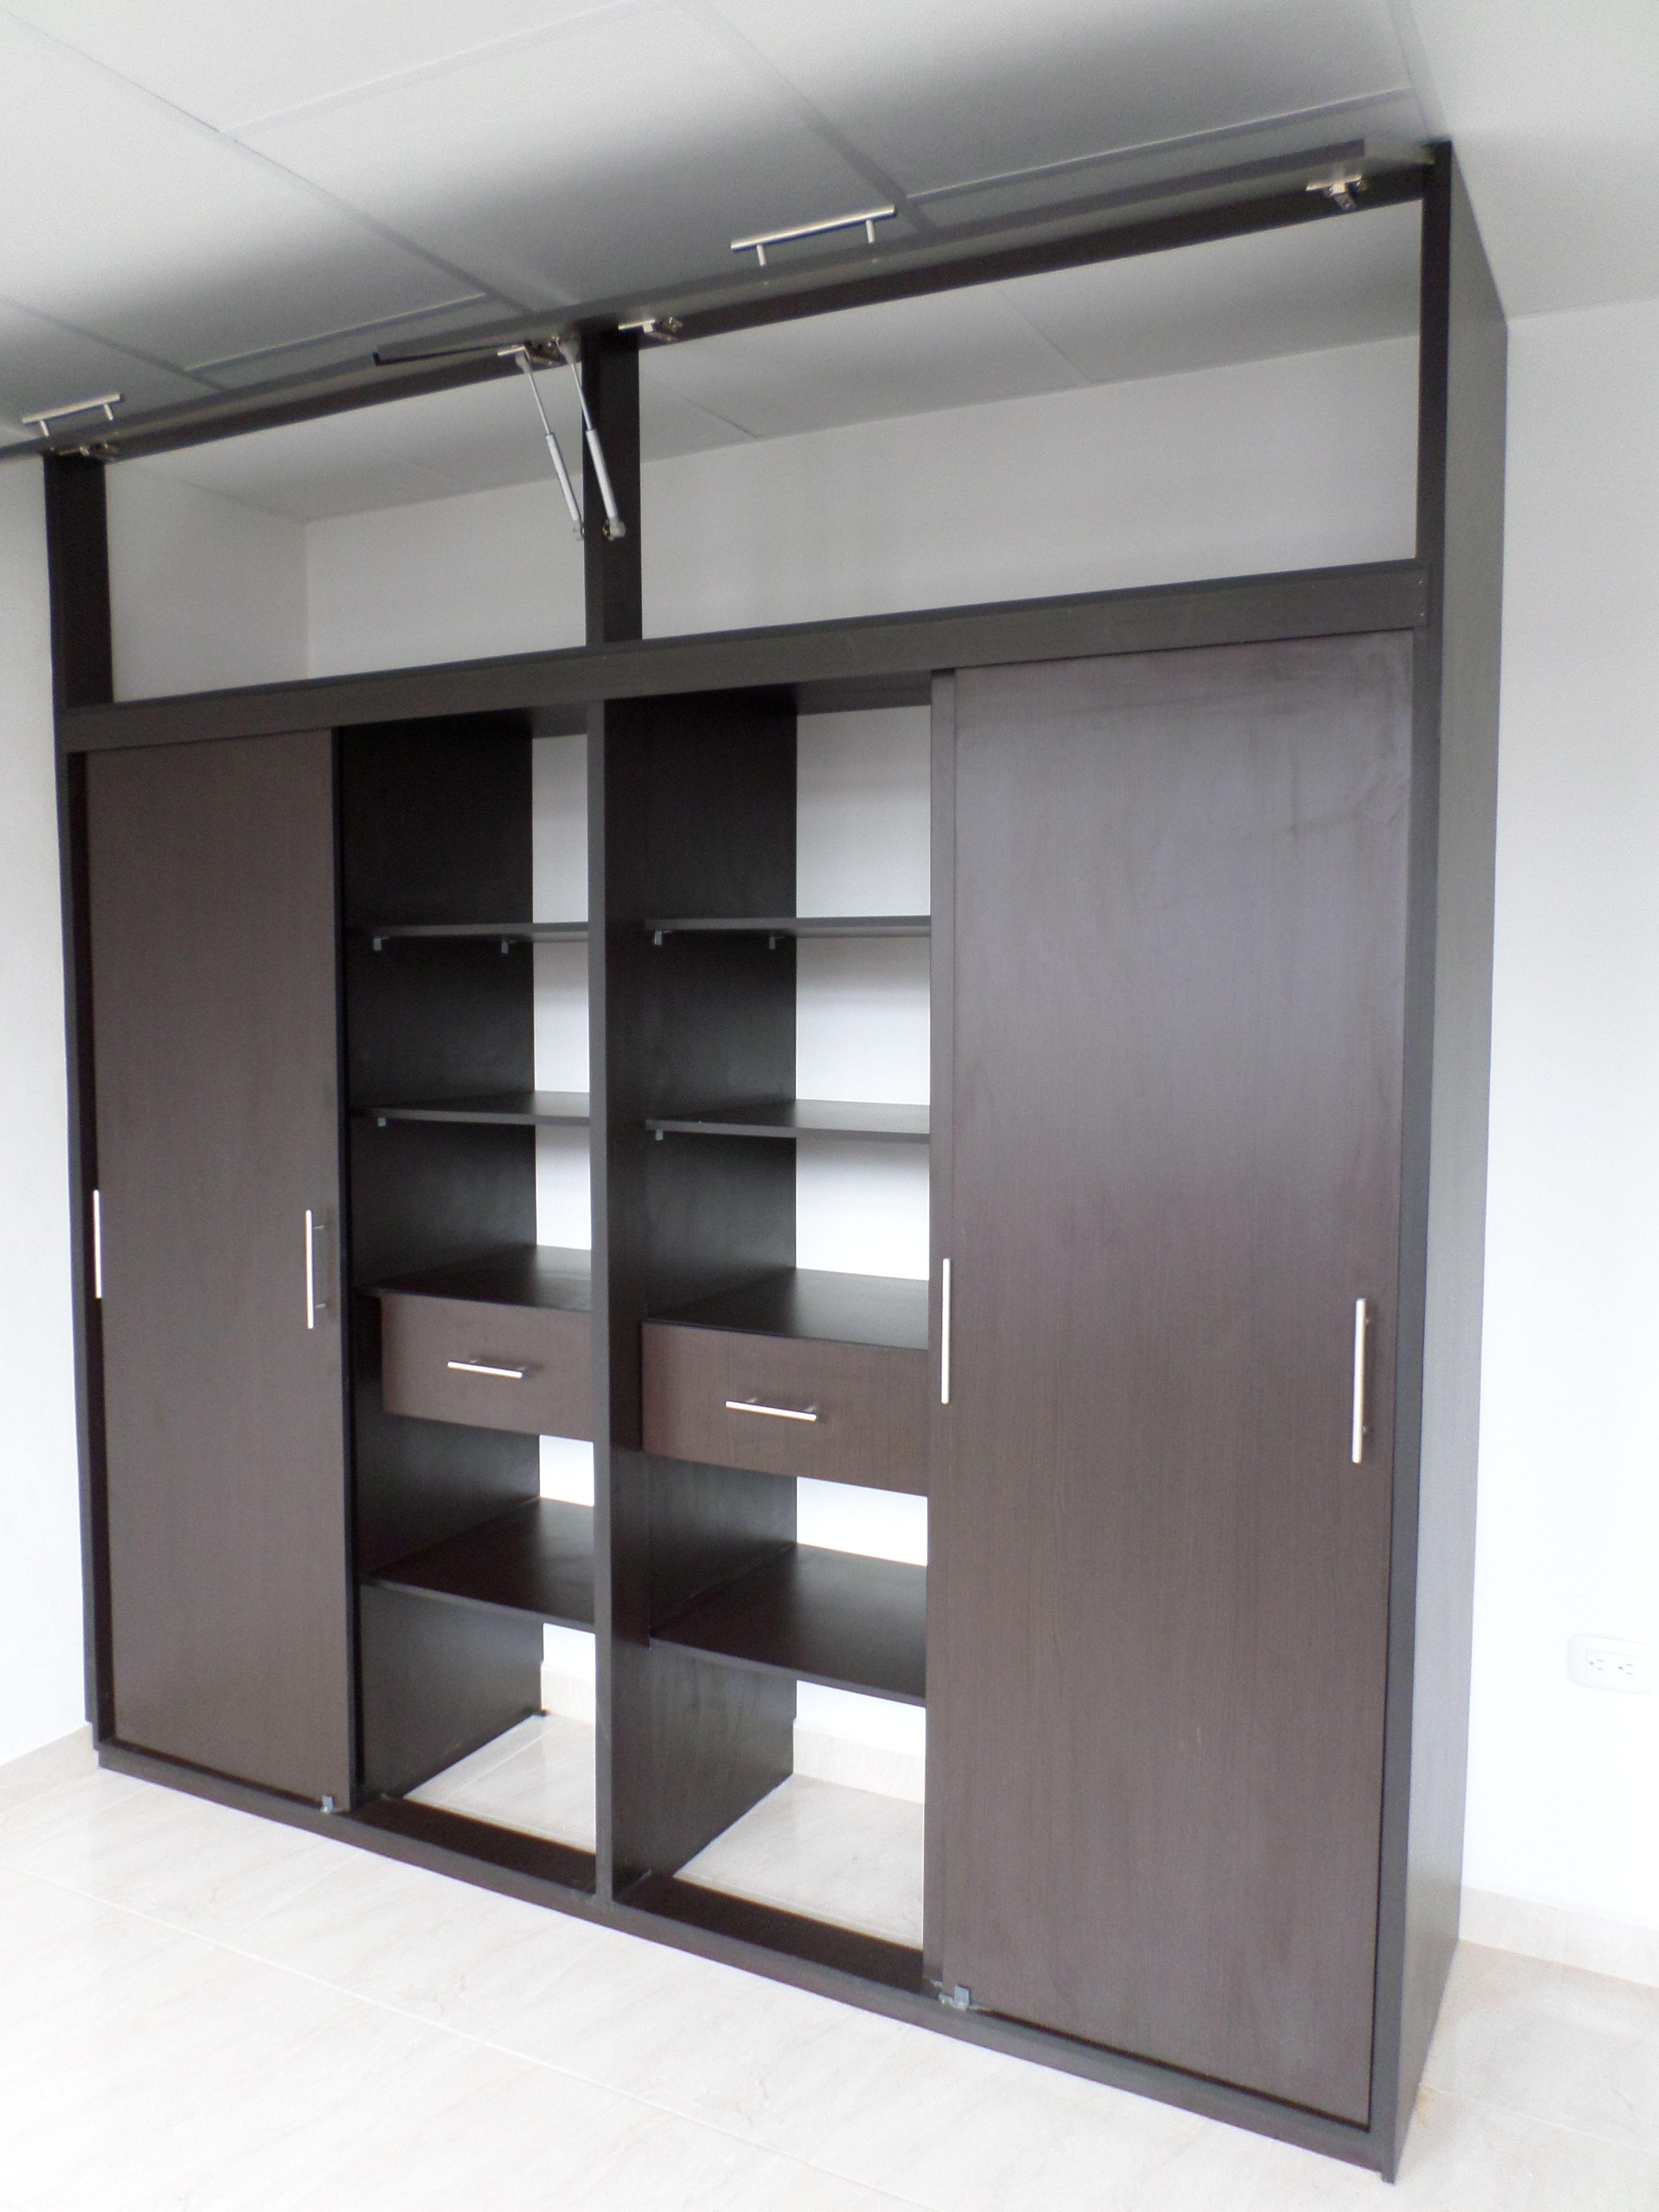 Pin By Shravan Kumar On Closets Bedroom Closet Design Wardrobe Door Designs Cupboard Design